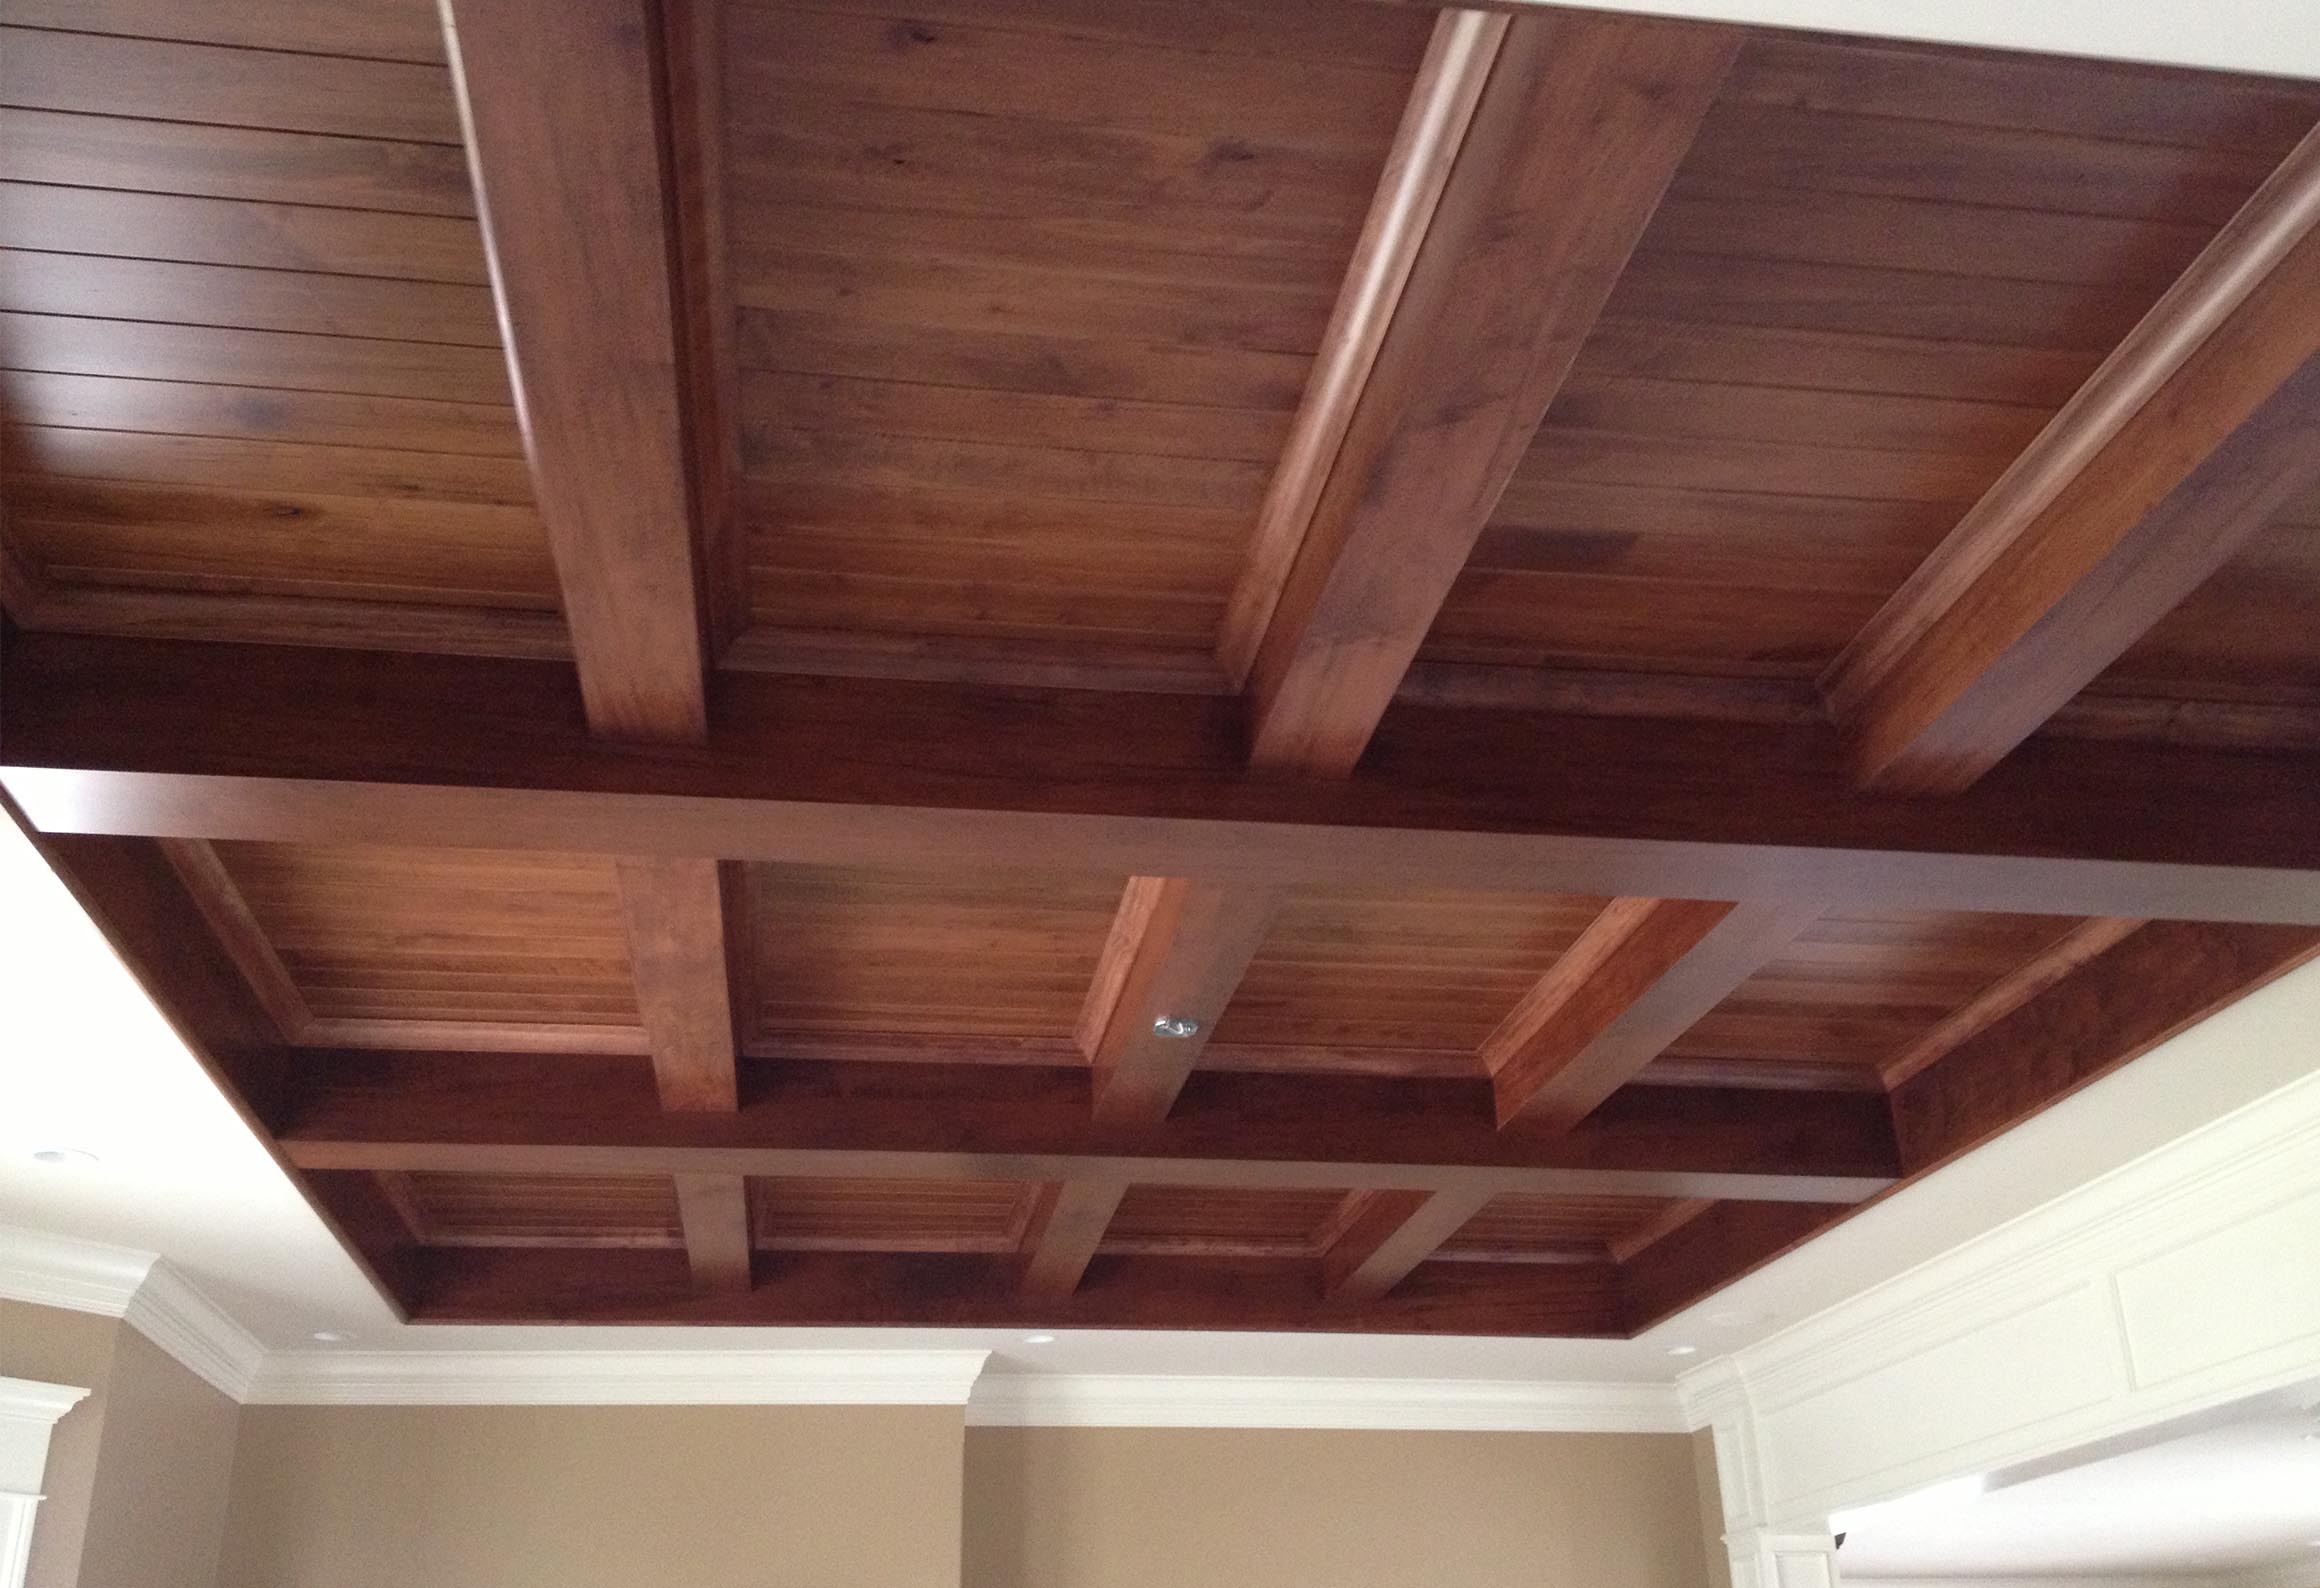 Wood Specialties by Fehrenbacher - Ceilings